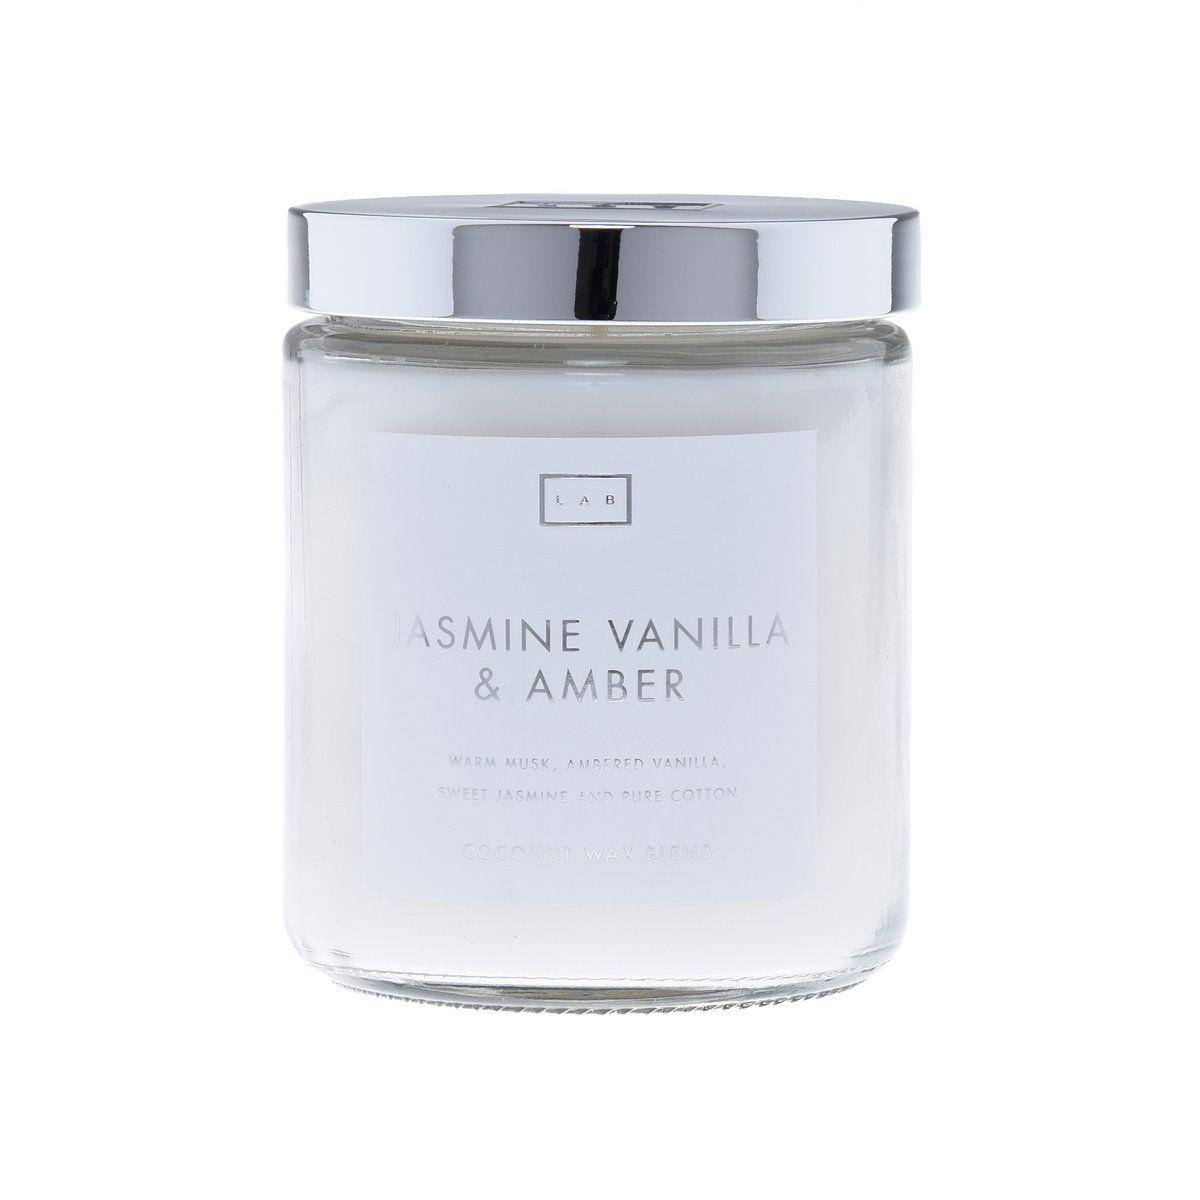 Jasmine vanilla amber labcandles vanilla amber jasmine